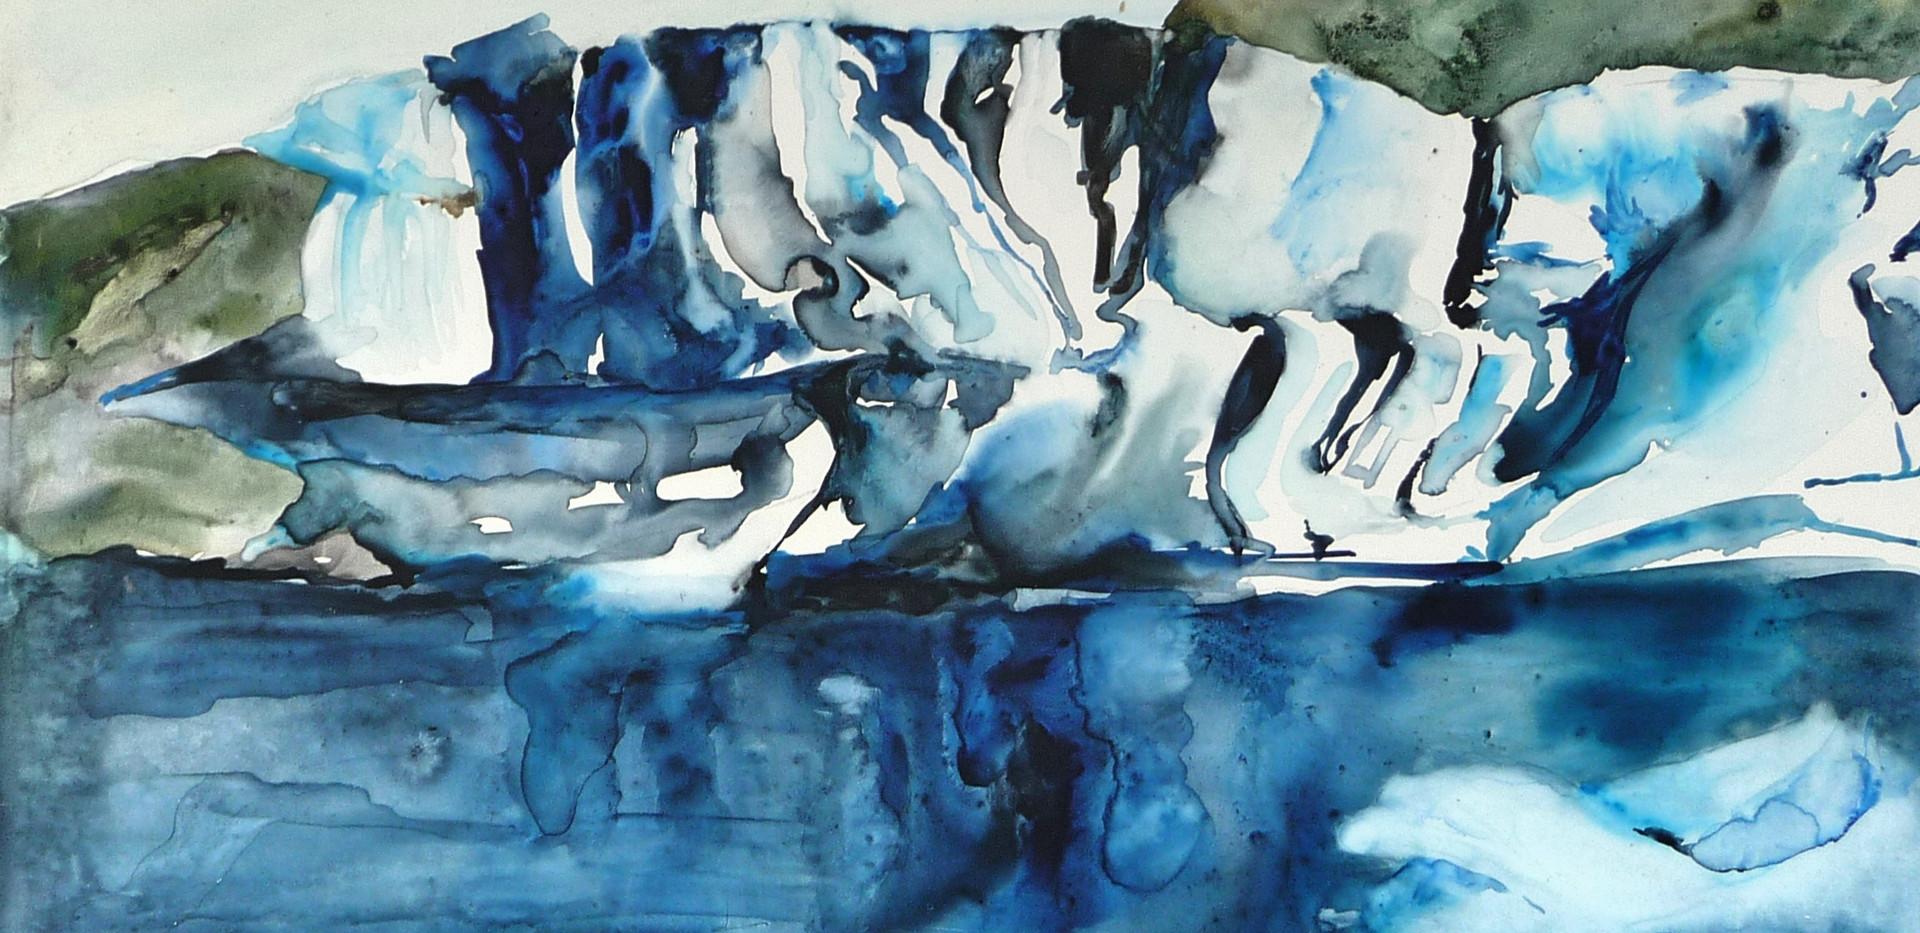 Striped Iceberg, Iceland